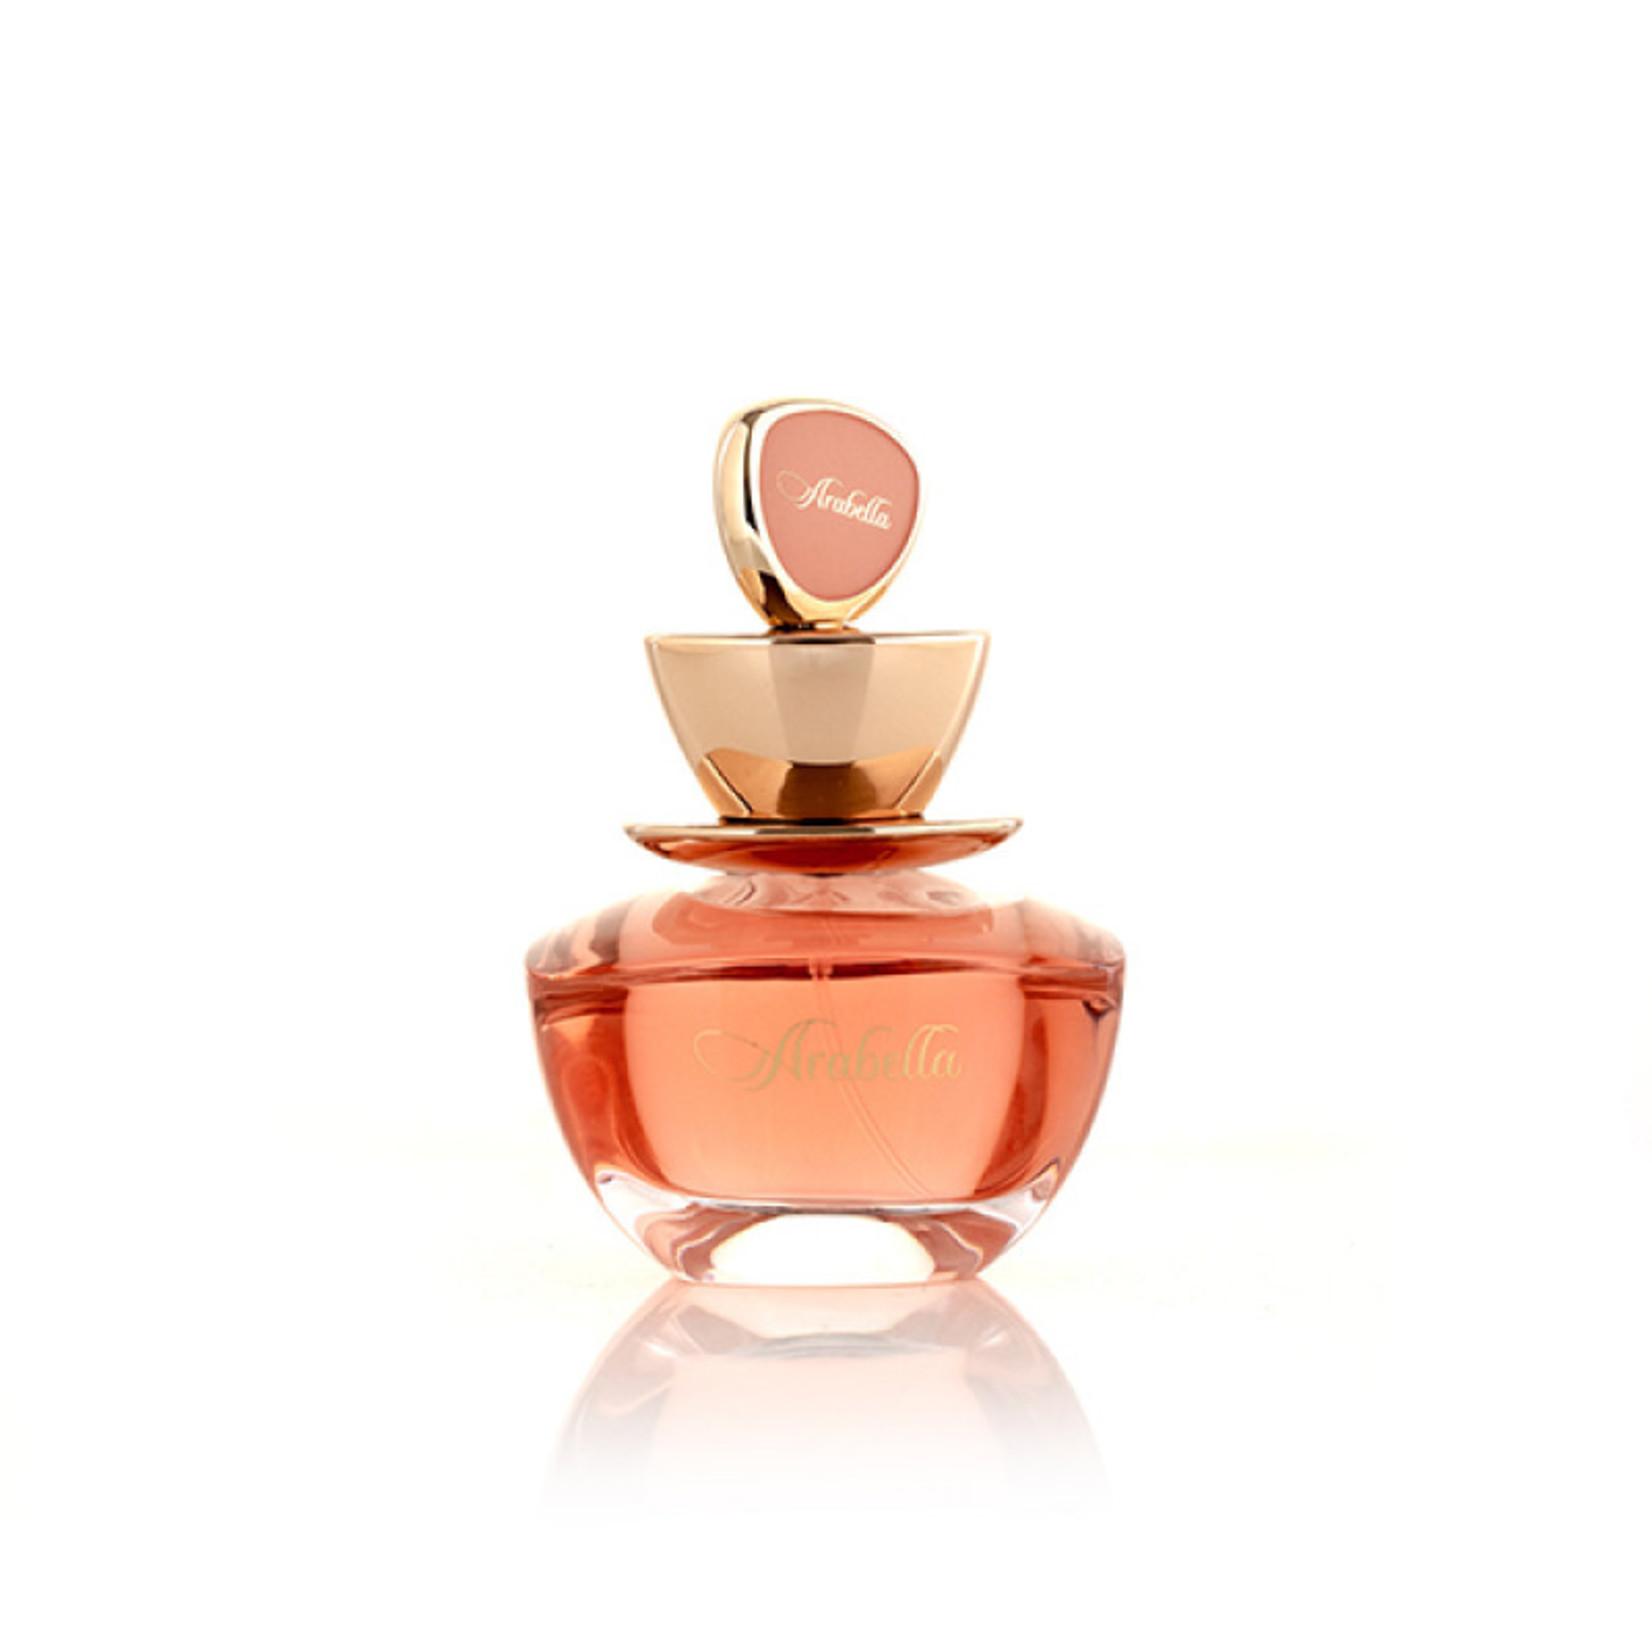 Arabella - 100ml. Eau de Parfum